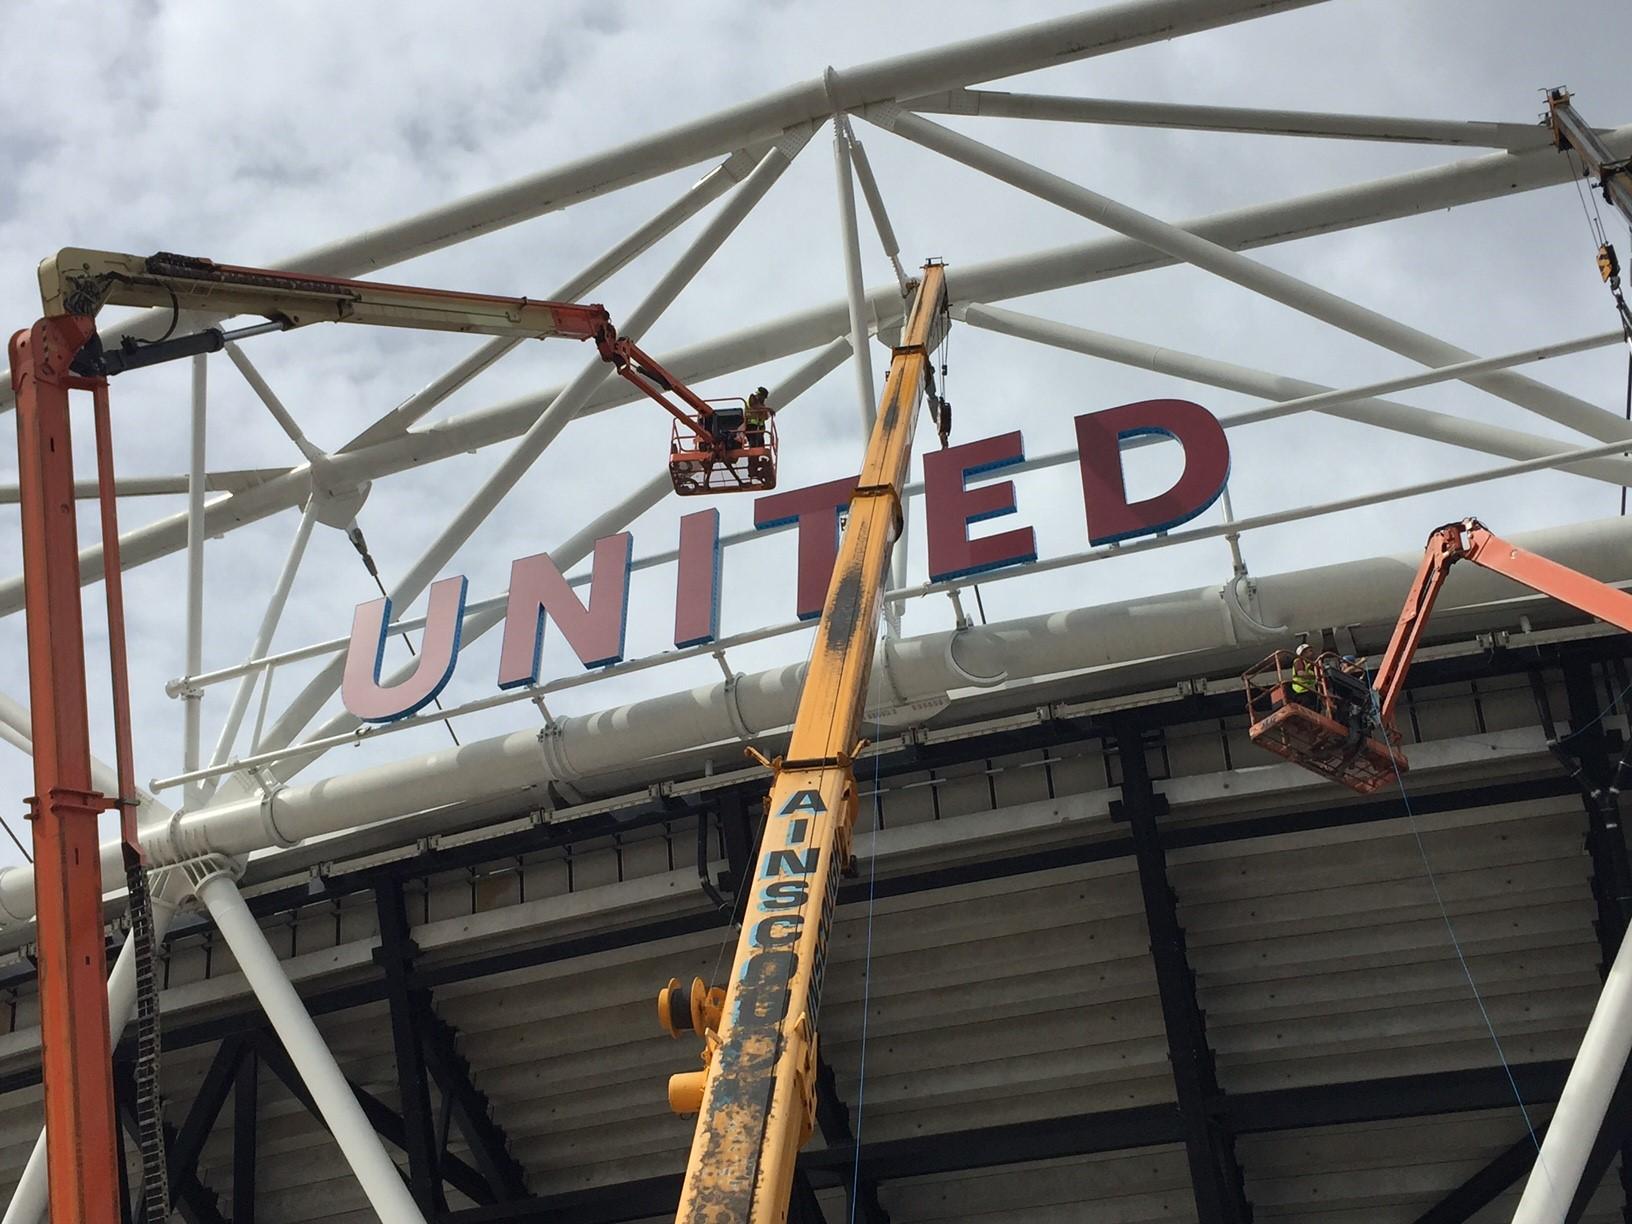 Commercial sign installation – Football stadium signage